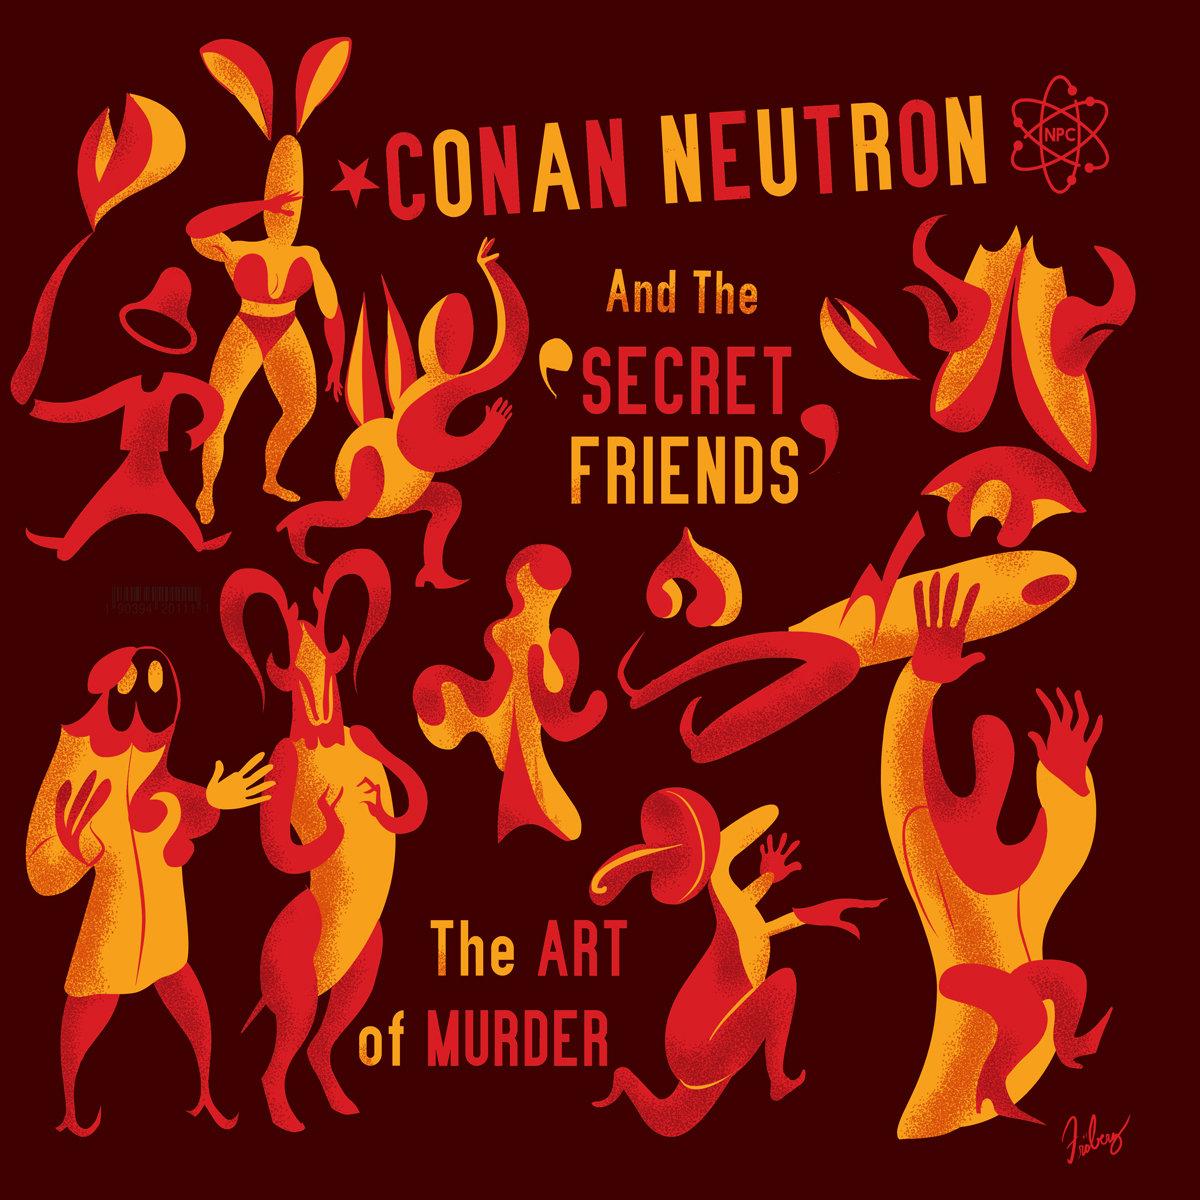 By Conan Neutron The Secret Friends